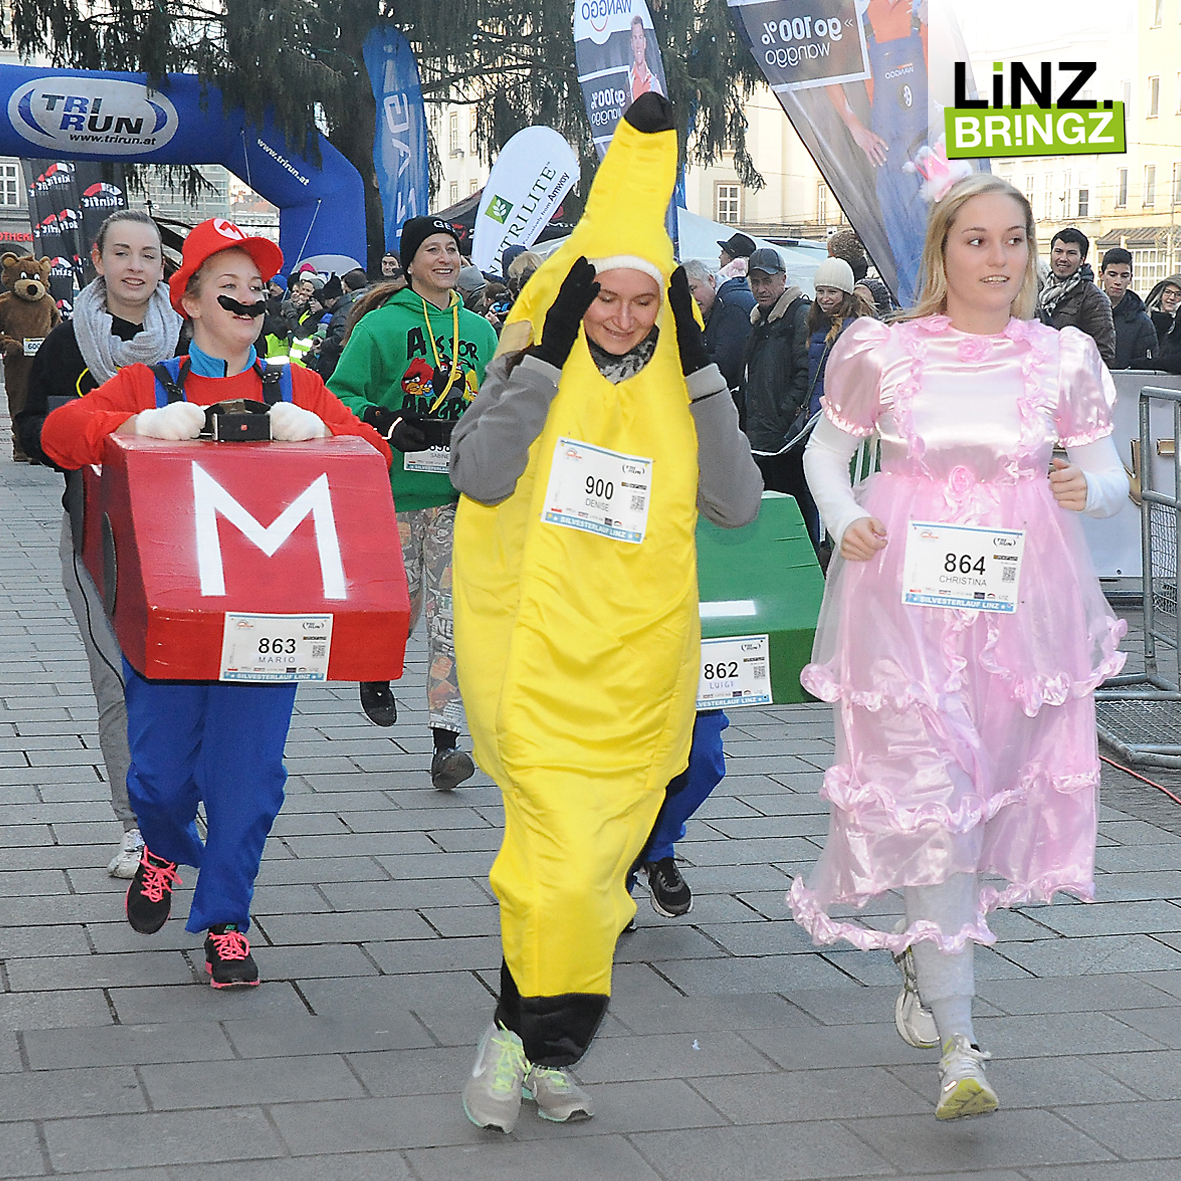 Silvesterlauf Linz 2017